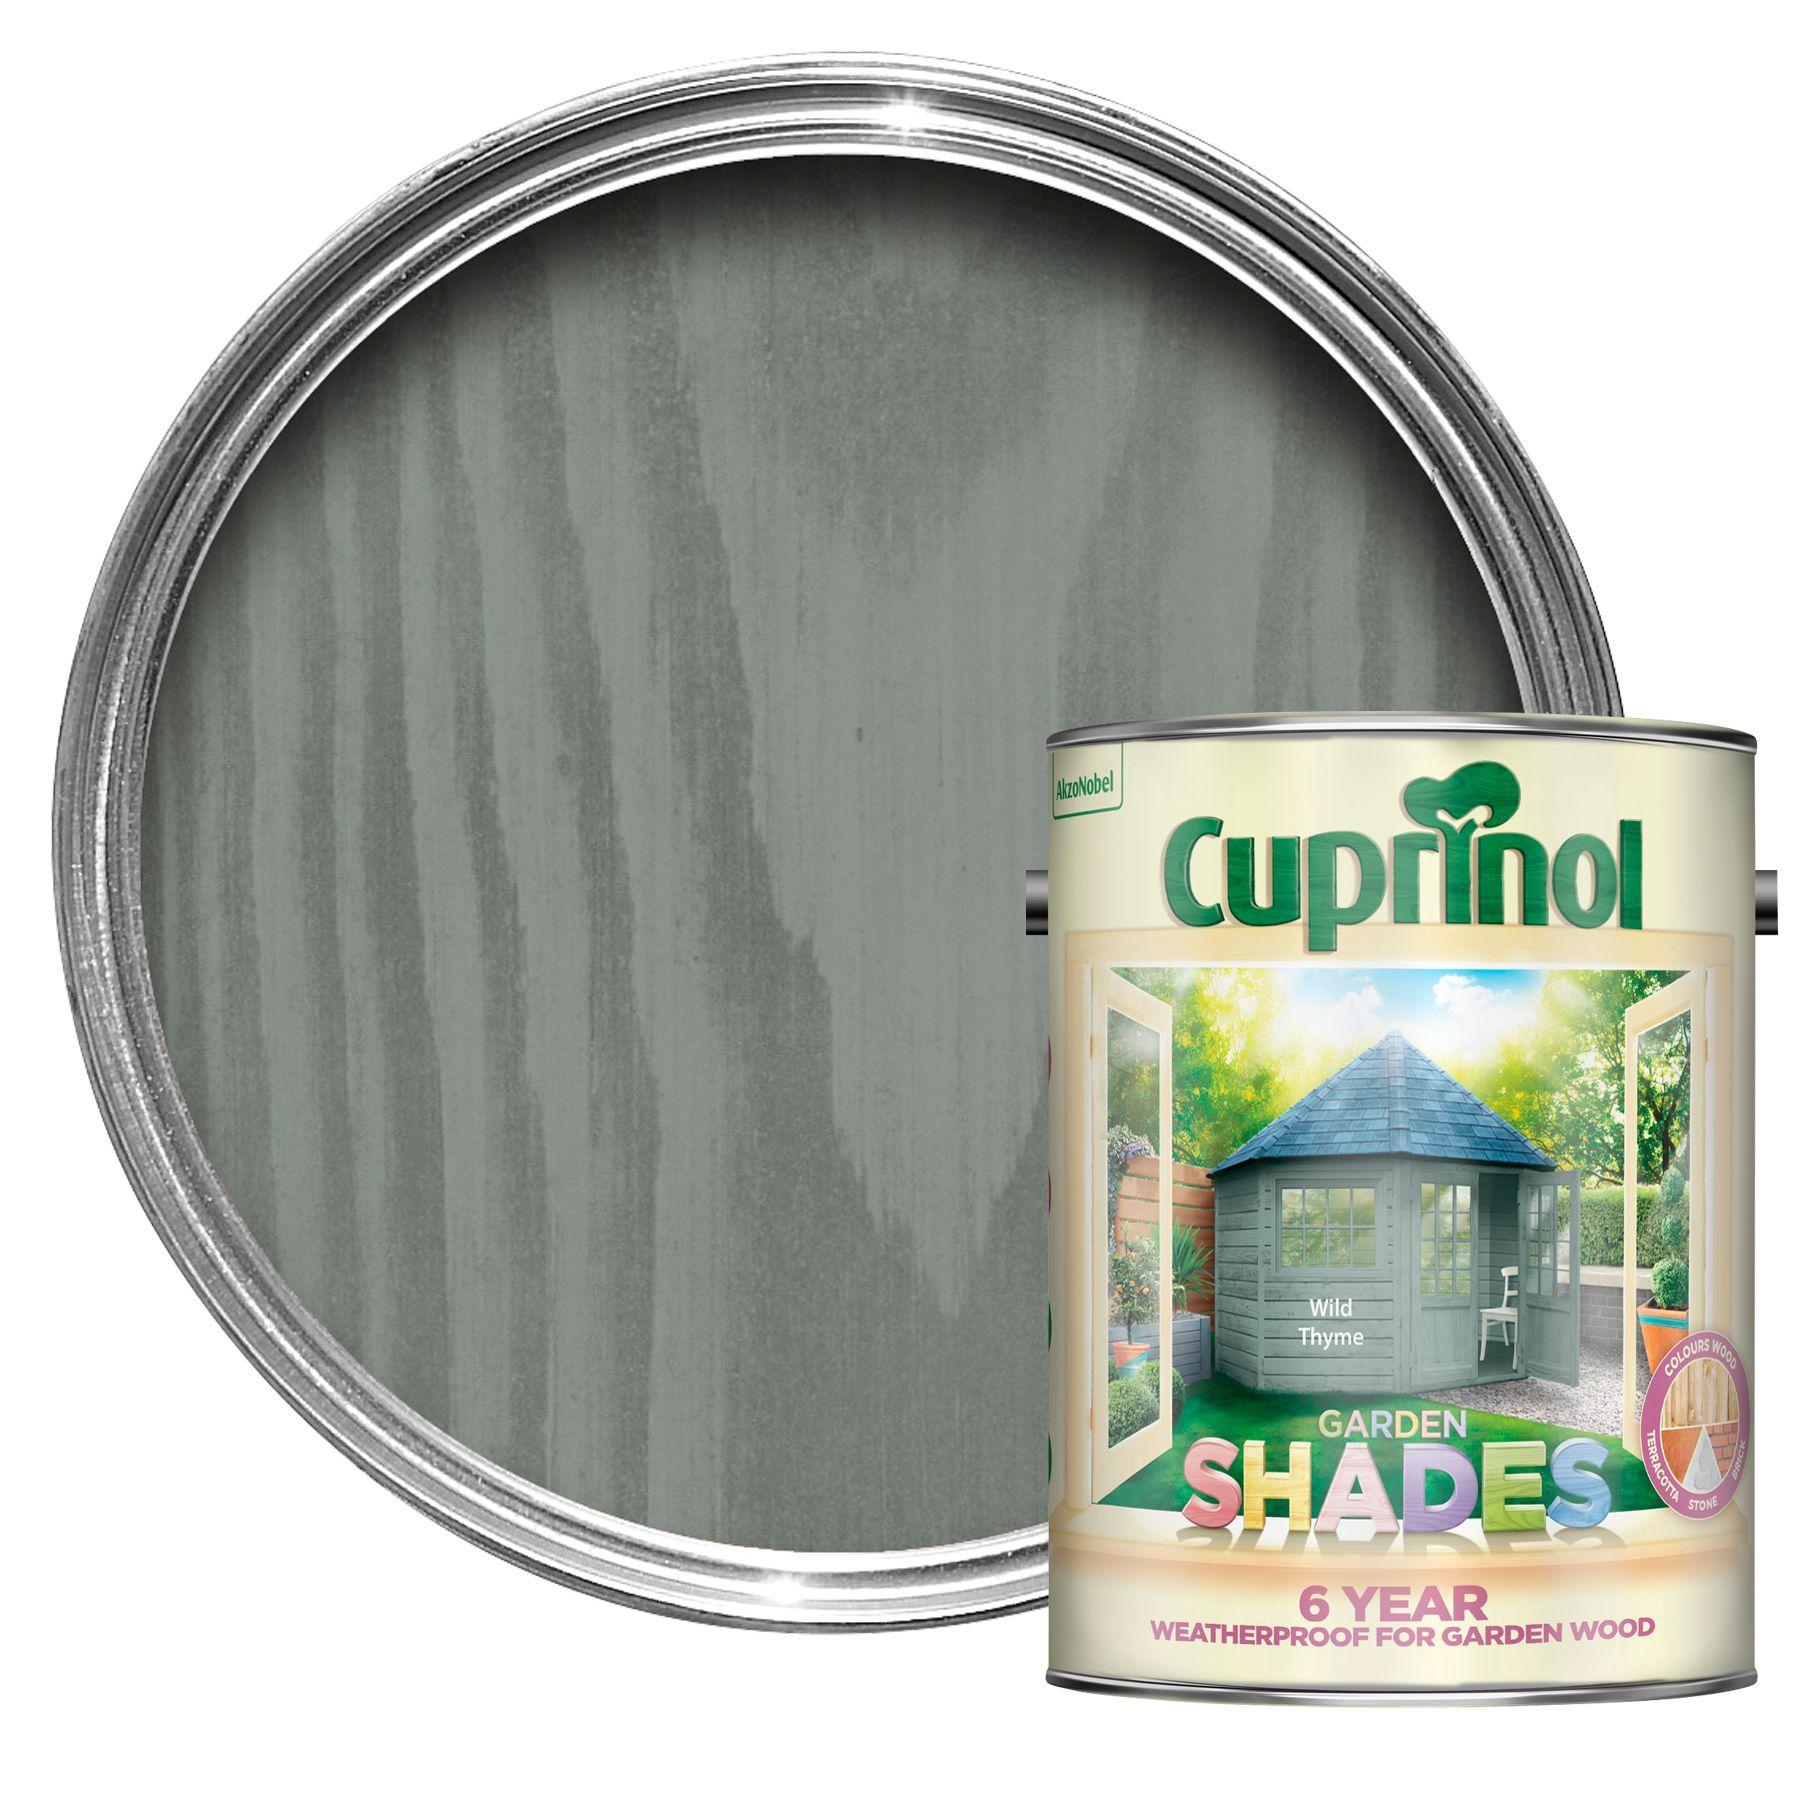 Cuprinol garden shades urban slate wood paint 2 5l departments diy at b q - Matt exterior paint image ...